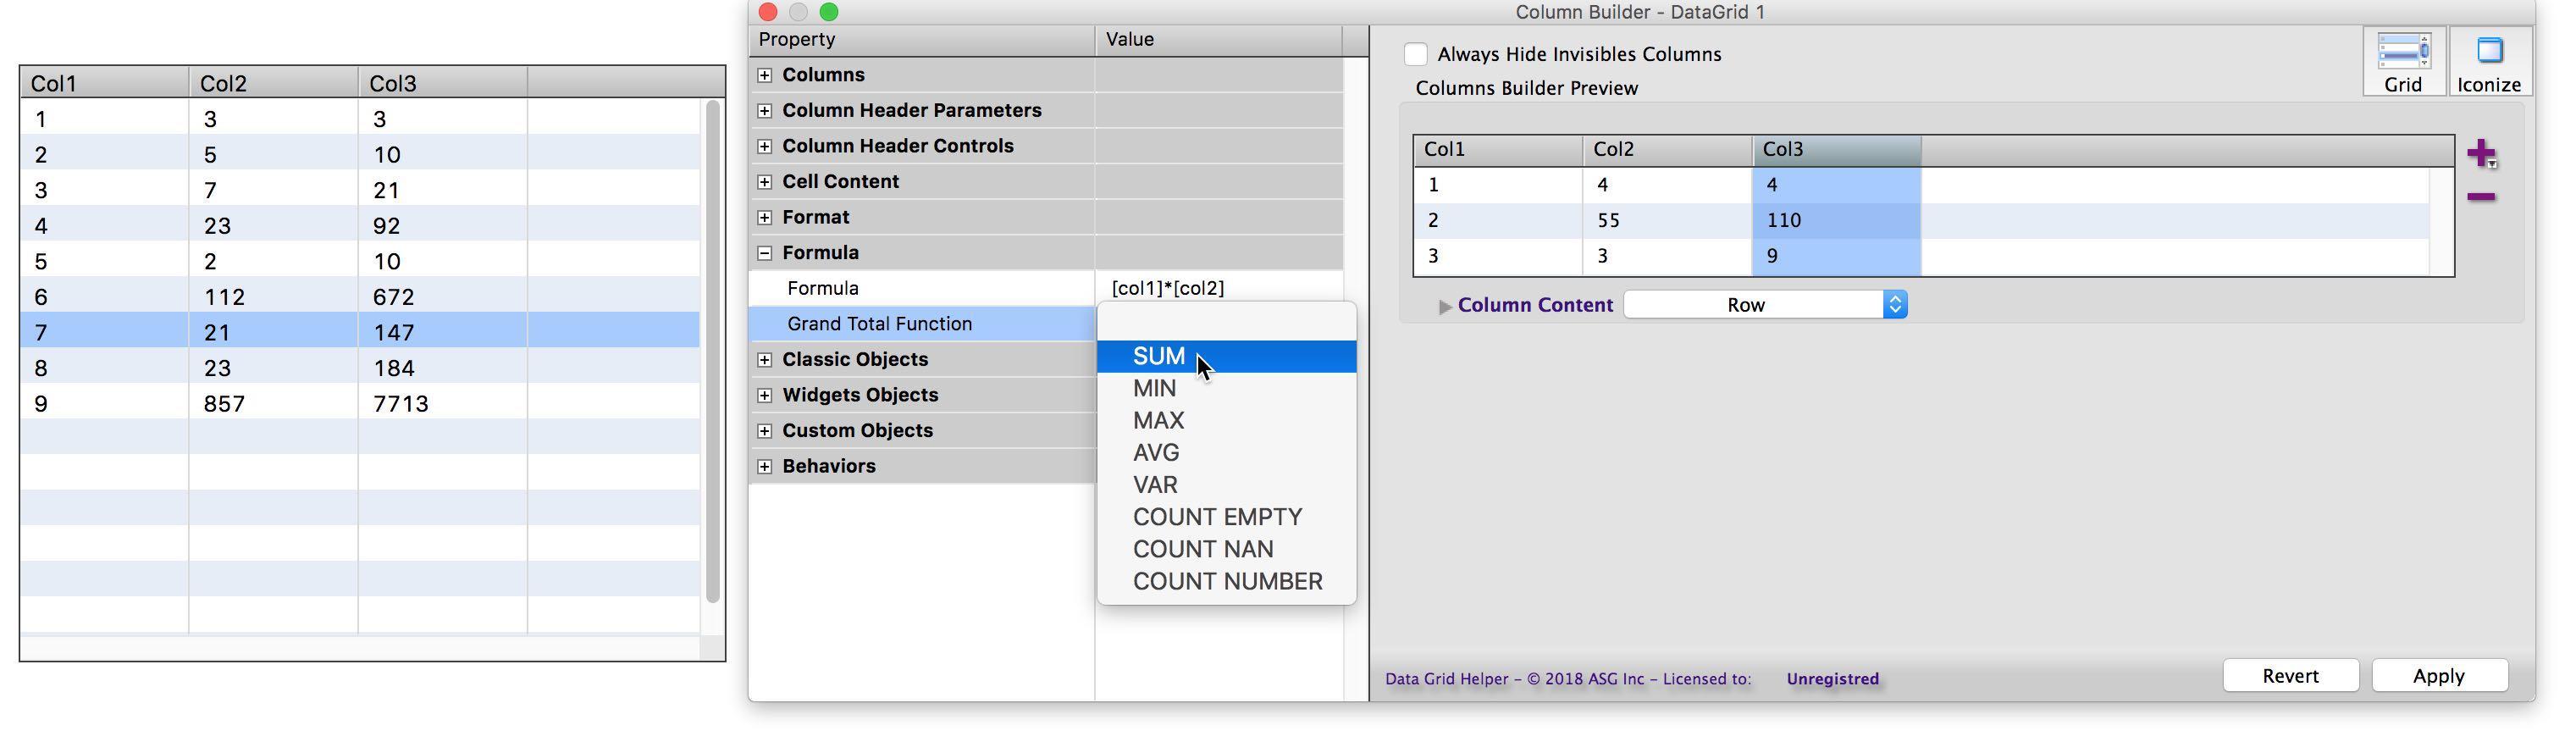 Data Grid Helper 2 5 adds support for Datagrid 2   LiveCode